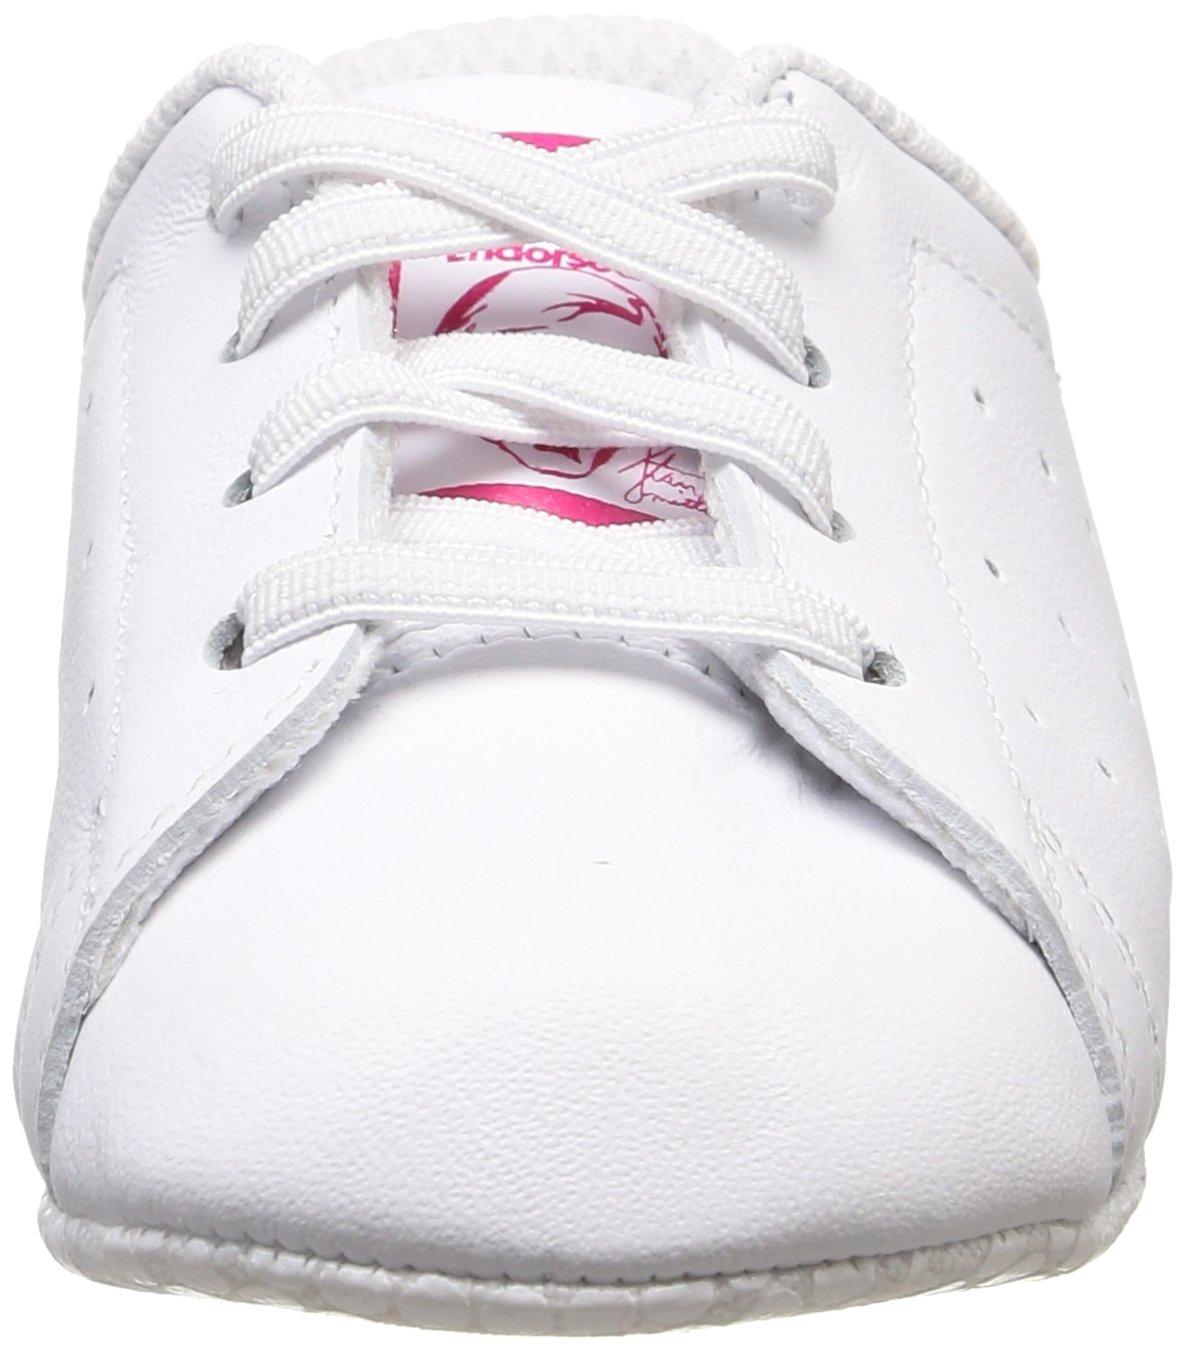 sports shoes 088be ecf33 Adidas Stan Smith Crib, Scarpe da Ginnastica Basse Unisex – Bimbi 0-24